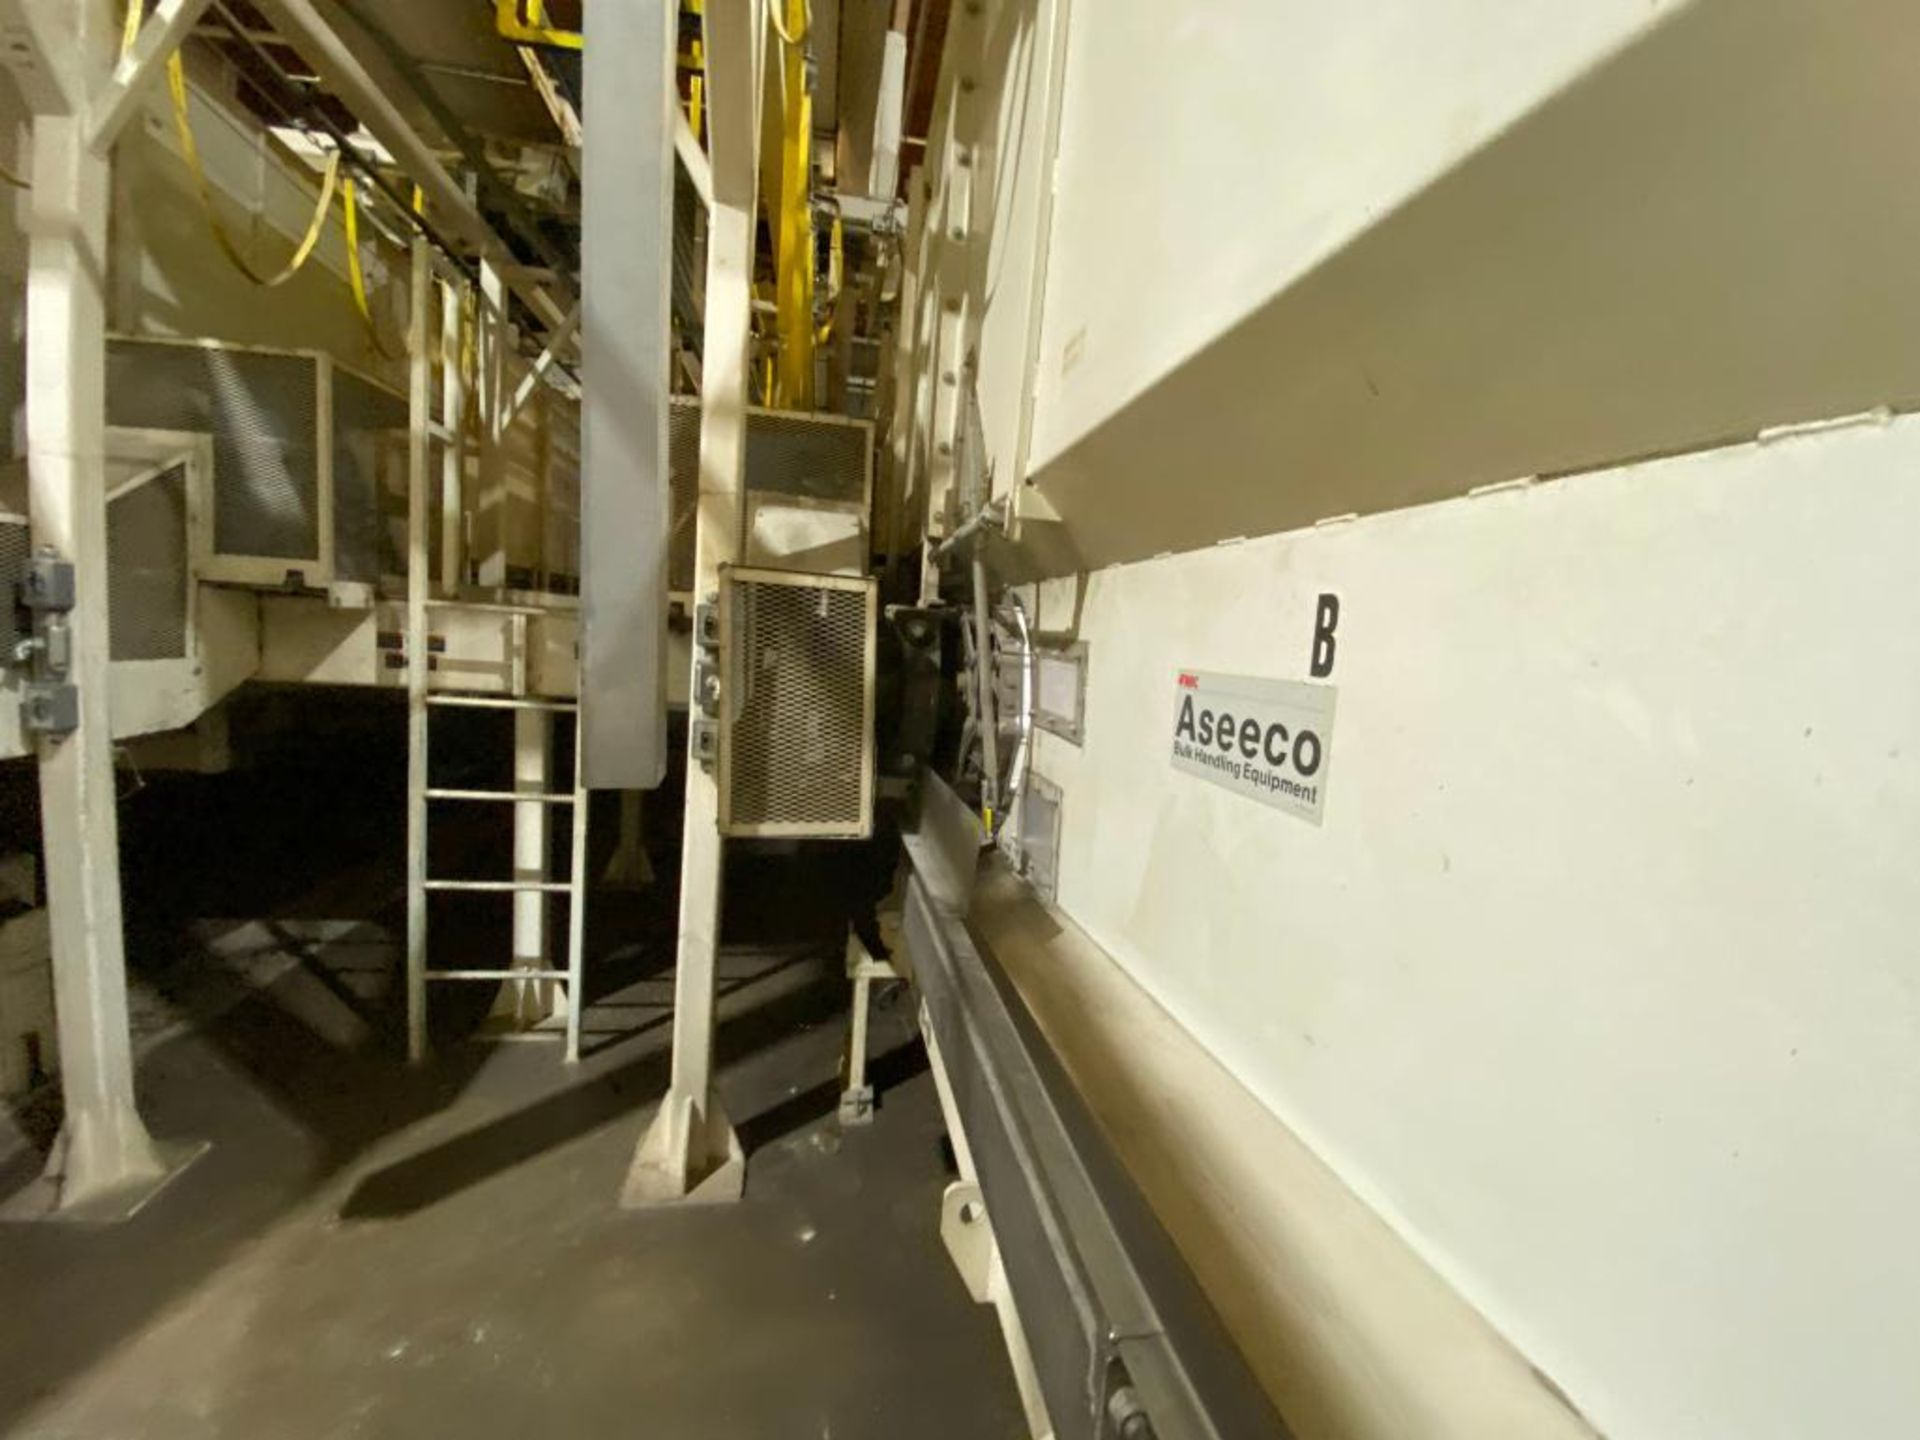 Link Belt vibratory conveyor - Image 4 of 4